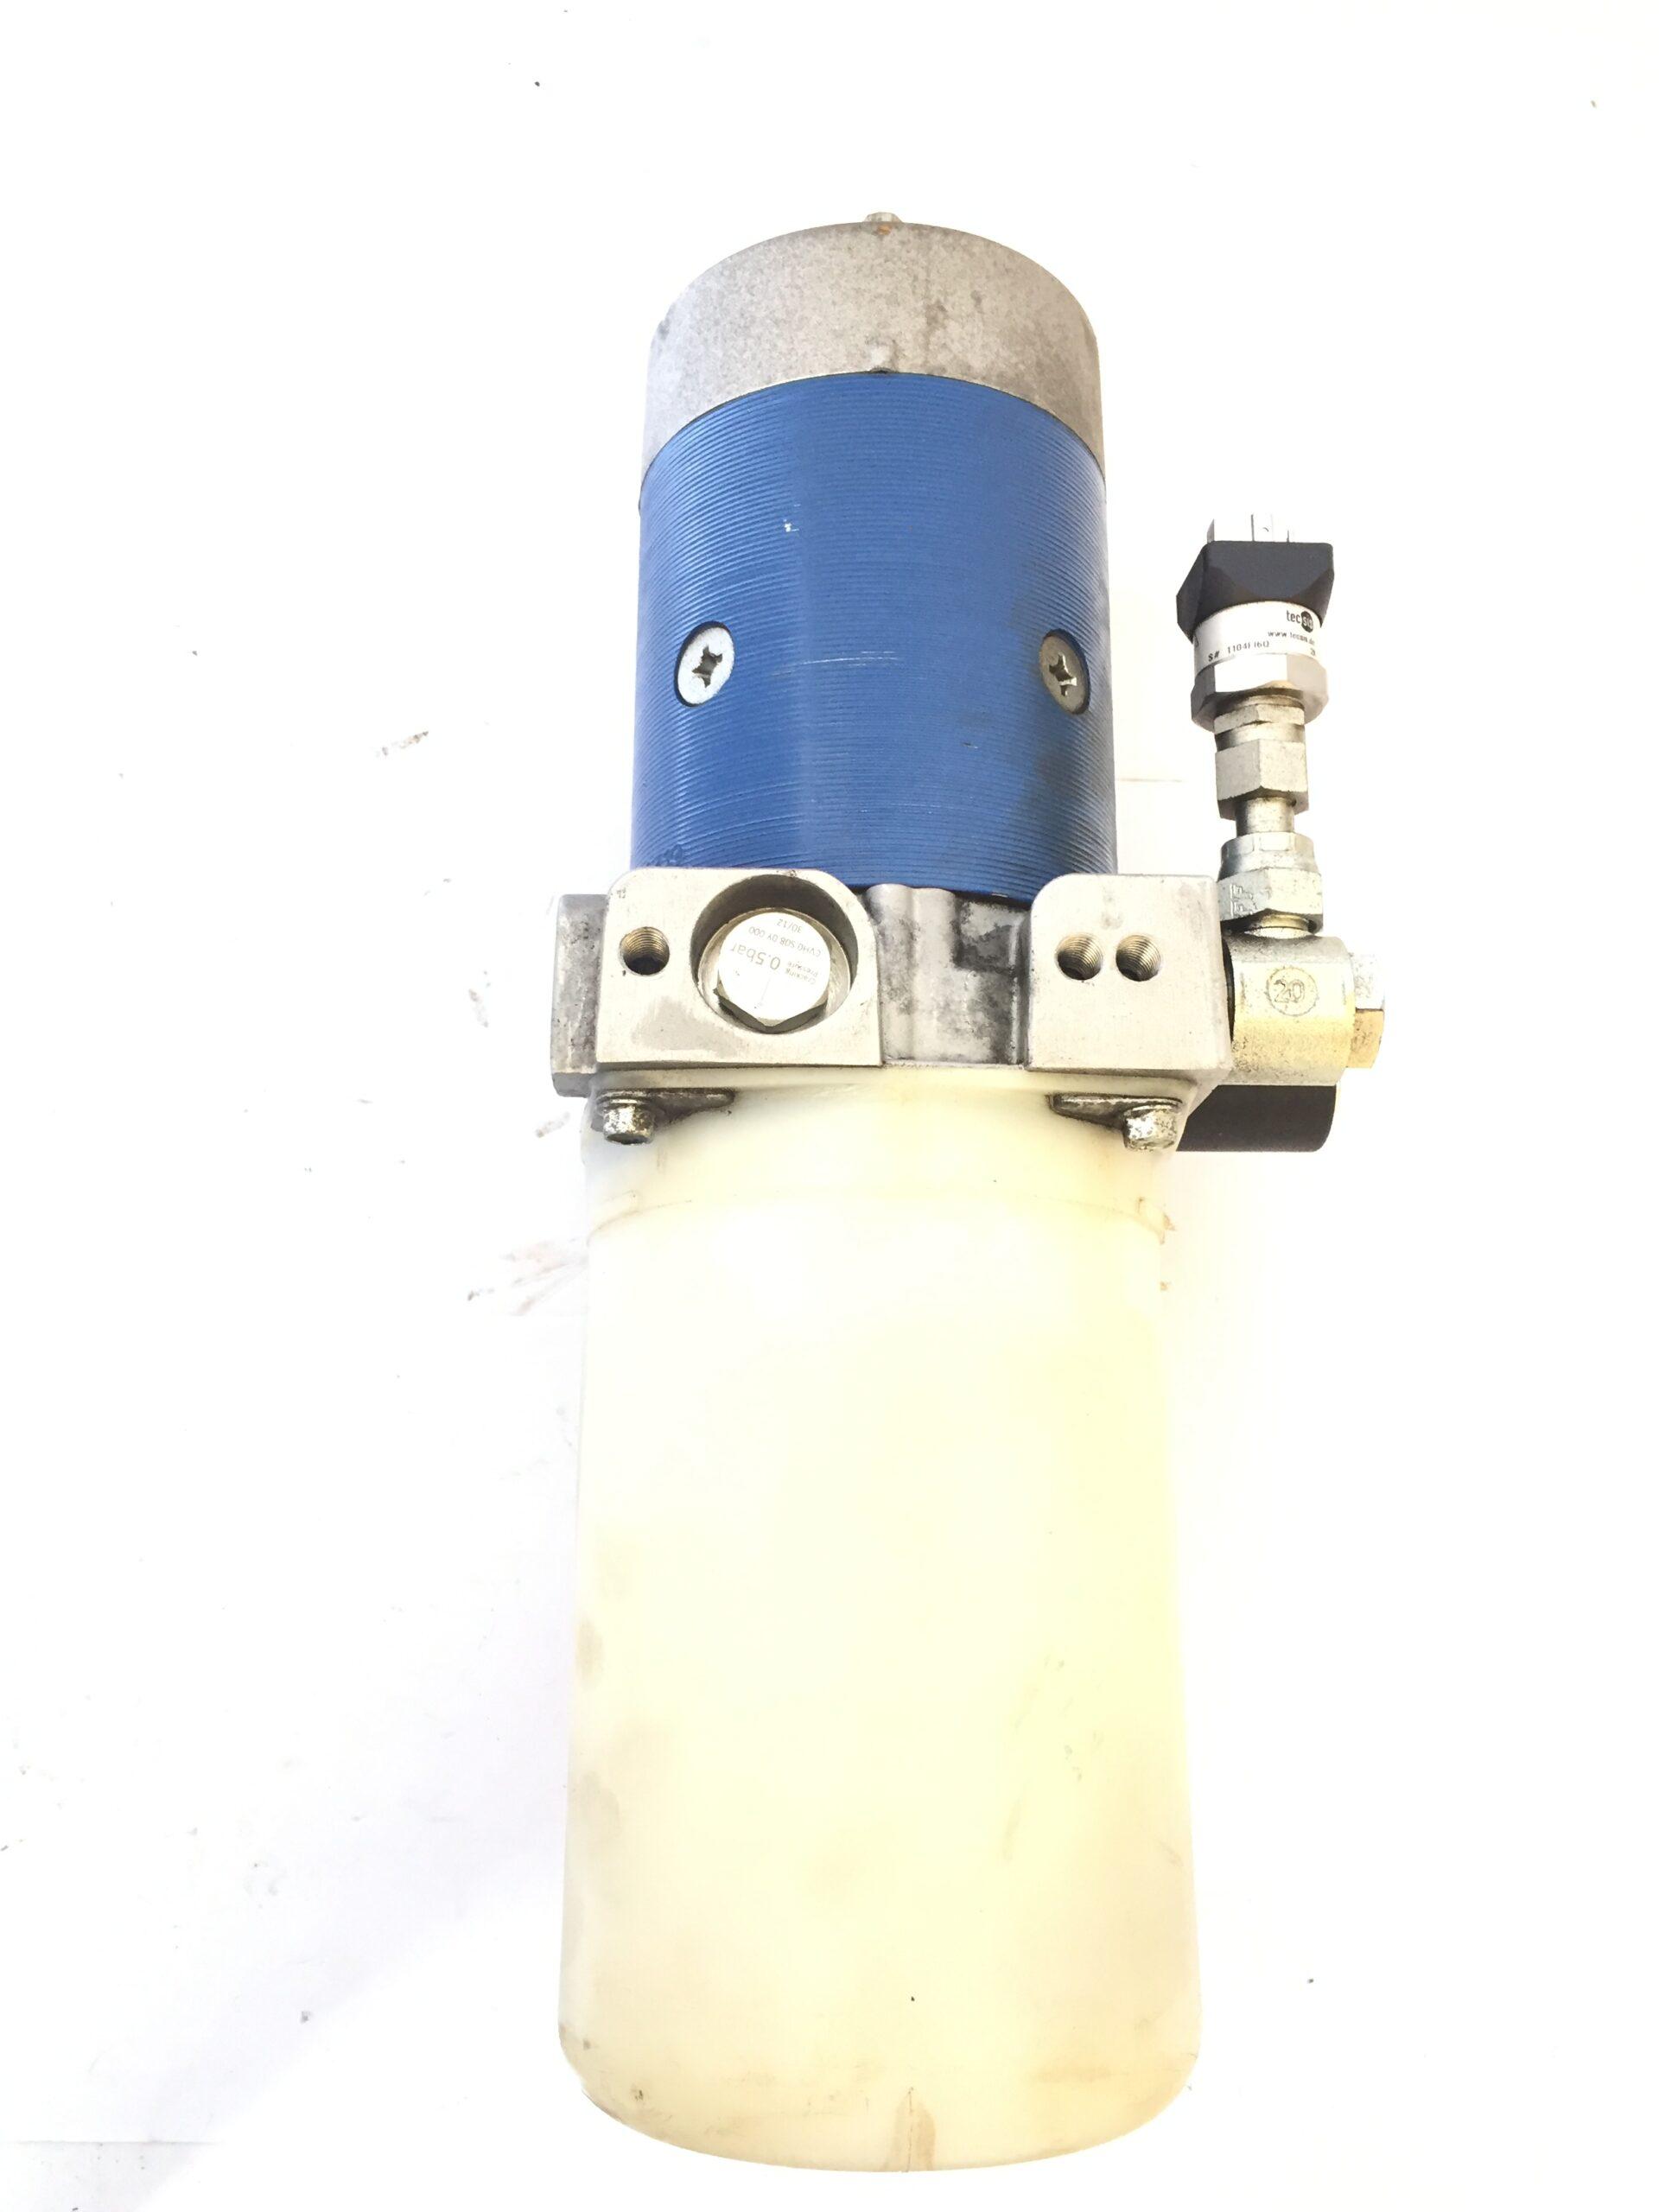   Hydraulic Pump   Fazl-e-Rasheed and Company August 2021